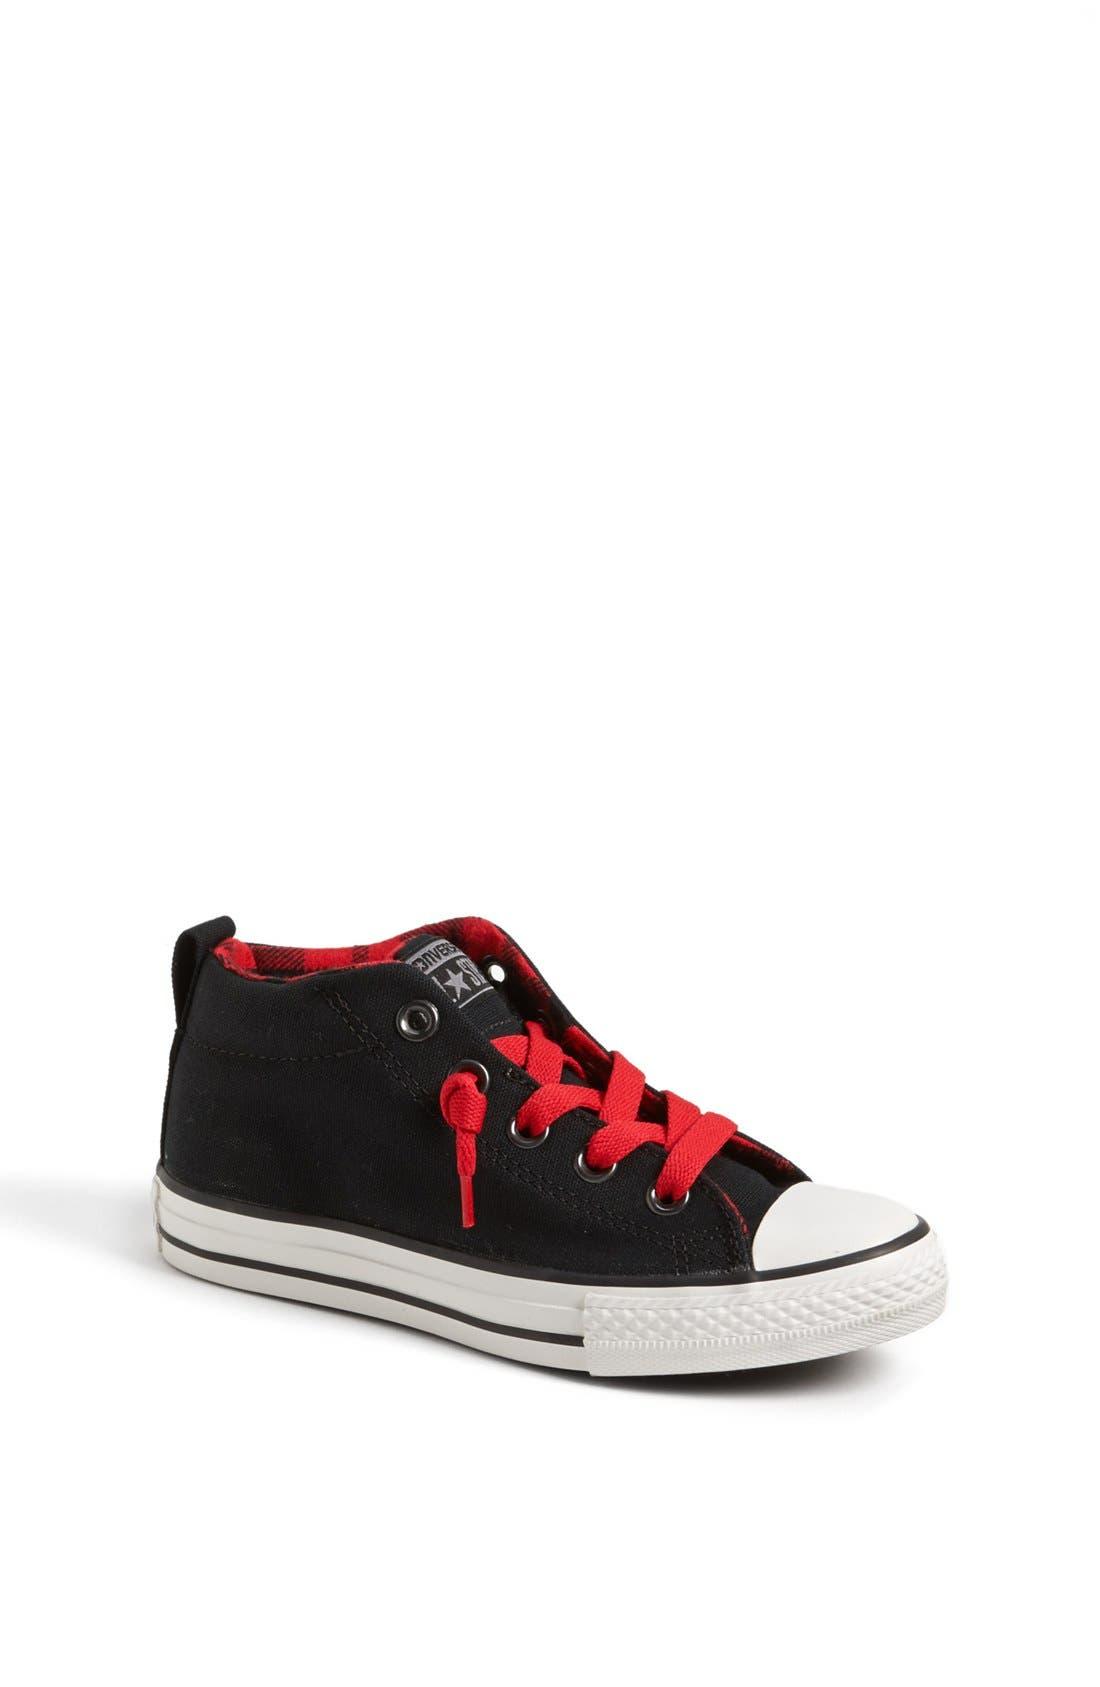 Main Image - Converse Chuck Taylor® 'CT AS Street' Slip-On Sneaker (Toddler, Little Kid & Big Kid)